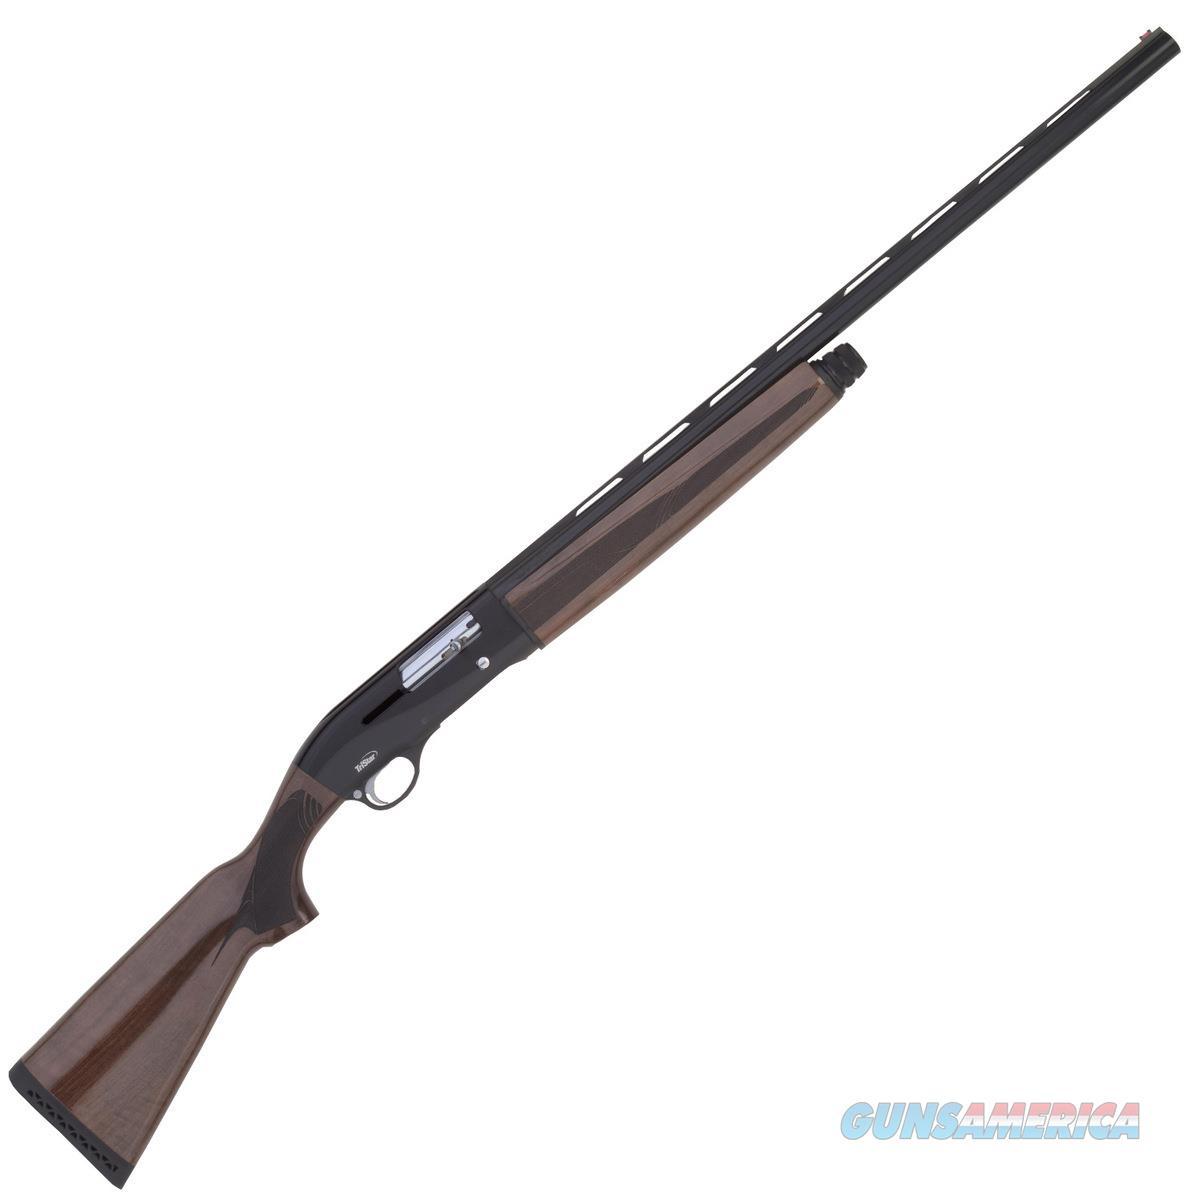 "TriStar Arms Raptor HP 2-Tone 20 Gauge 26"" 98057  Guns > Shotguns > Tristar Shotguns"